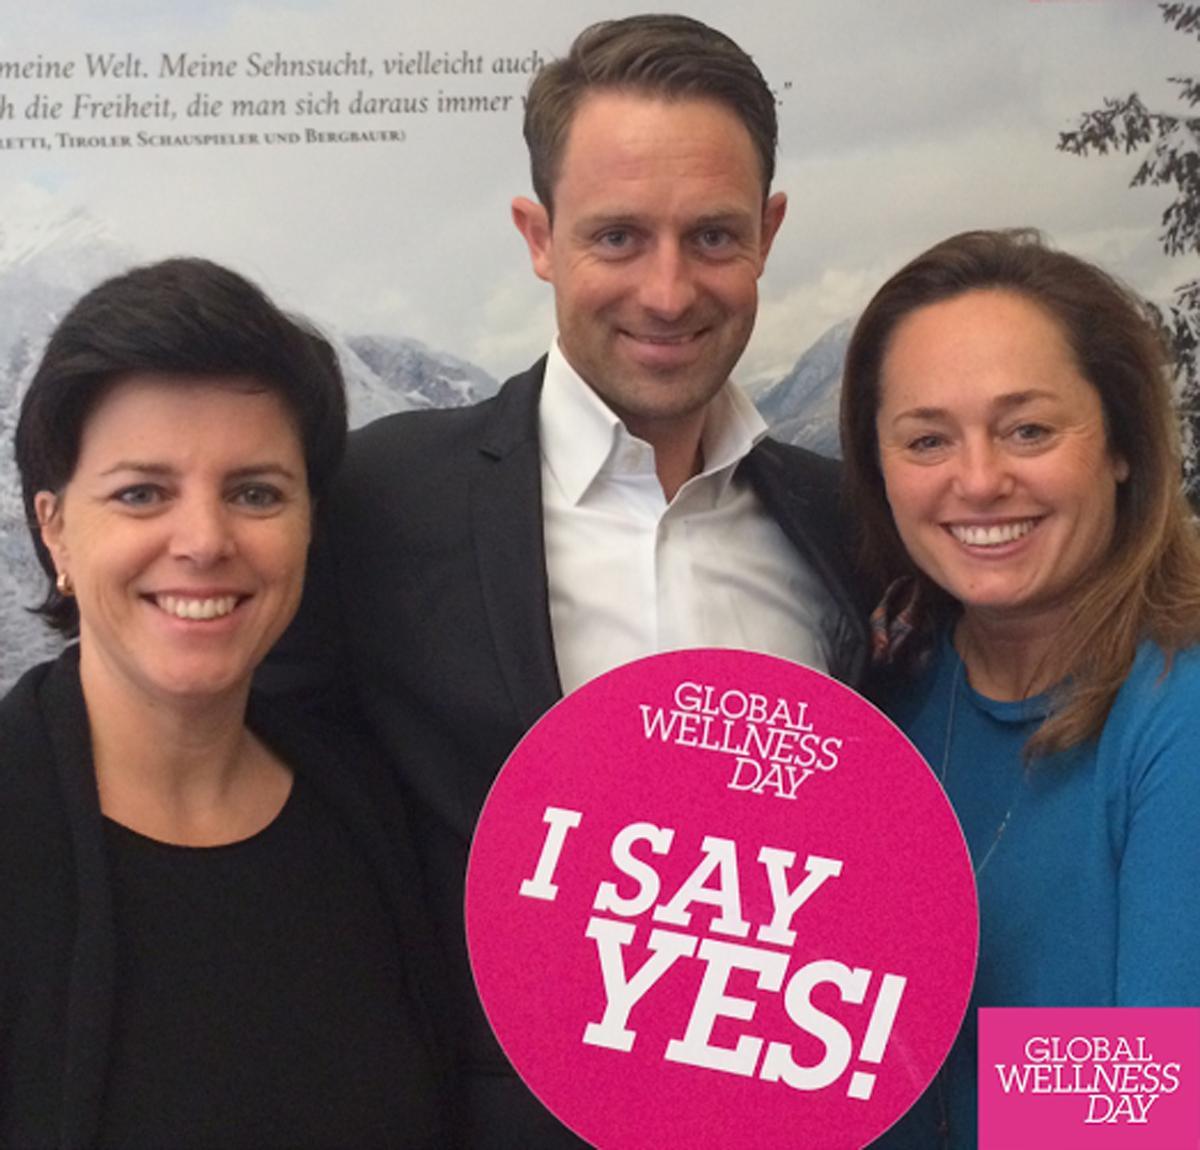 Karin Seiler-Lall (left) of Tirol Tourism, Adrian Egger (centre) of Thermarium Bäder-Bau and Claudia Knab of Tirol Tourism all said yes to Global Wellness Day / Global Wellness Day